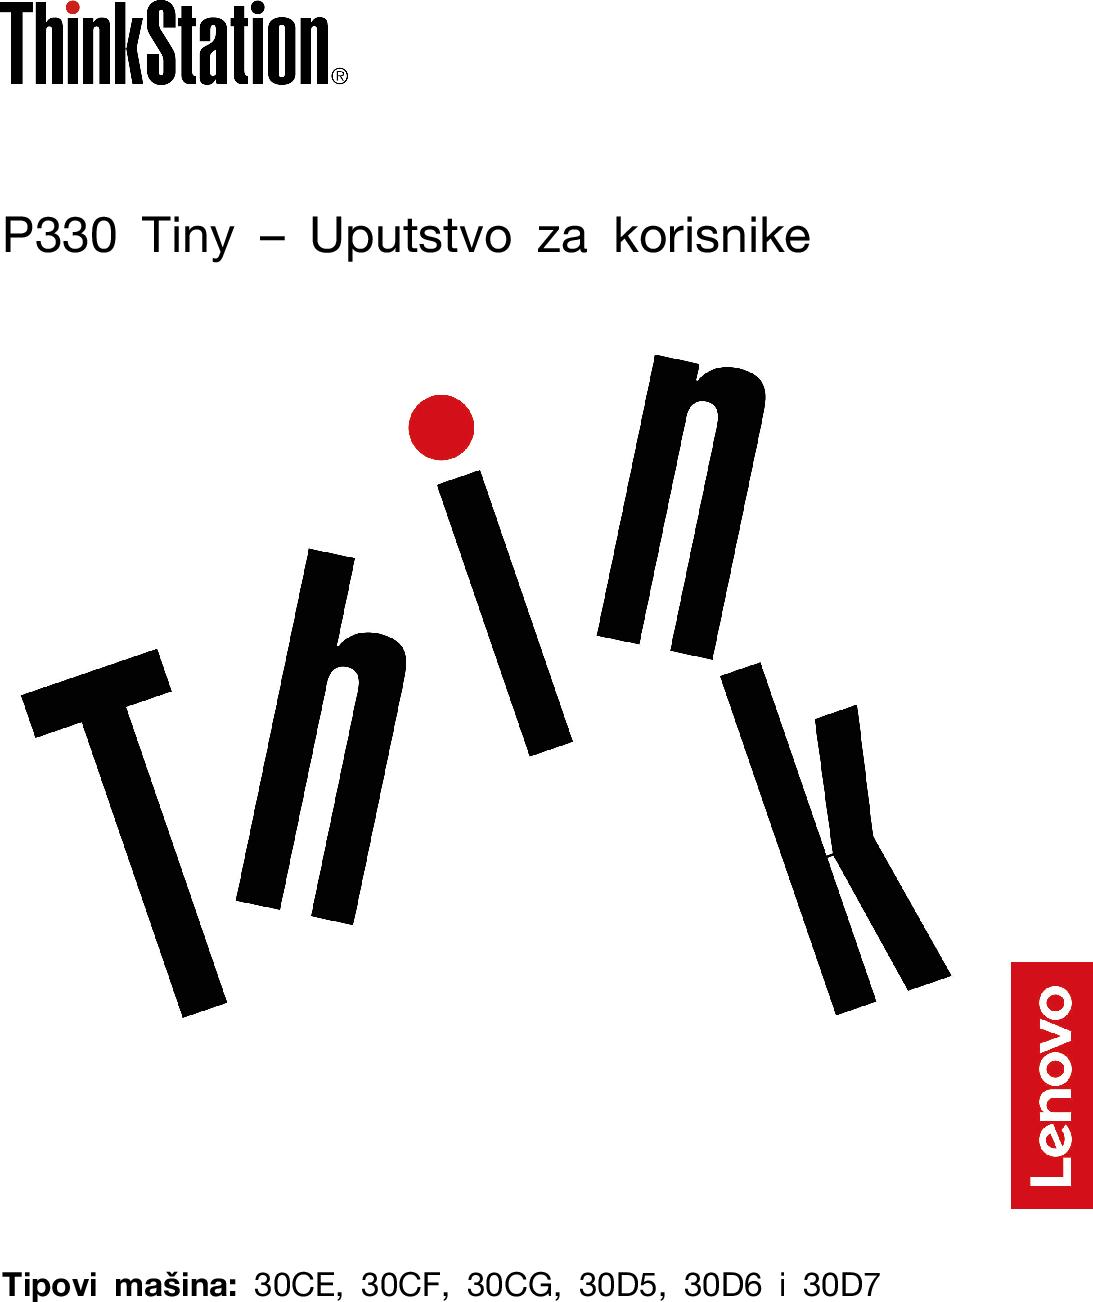 Lenovo P330 Tiny